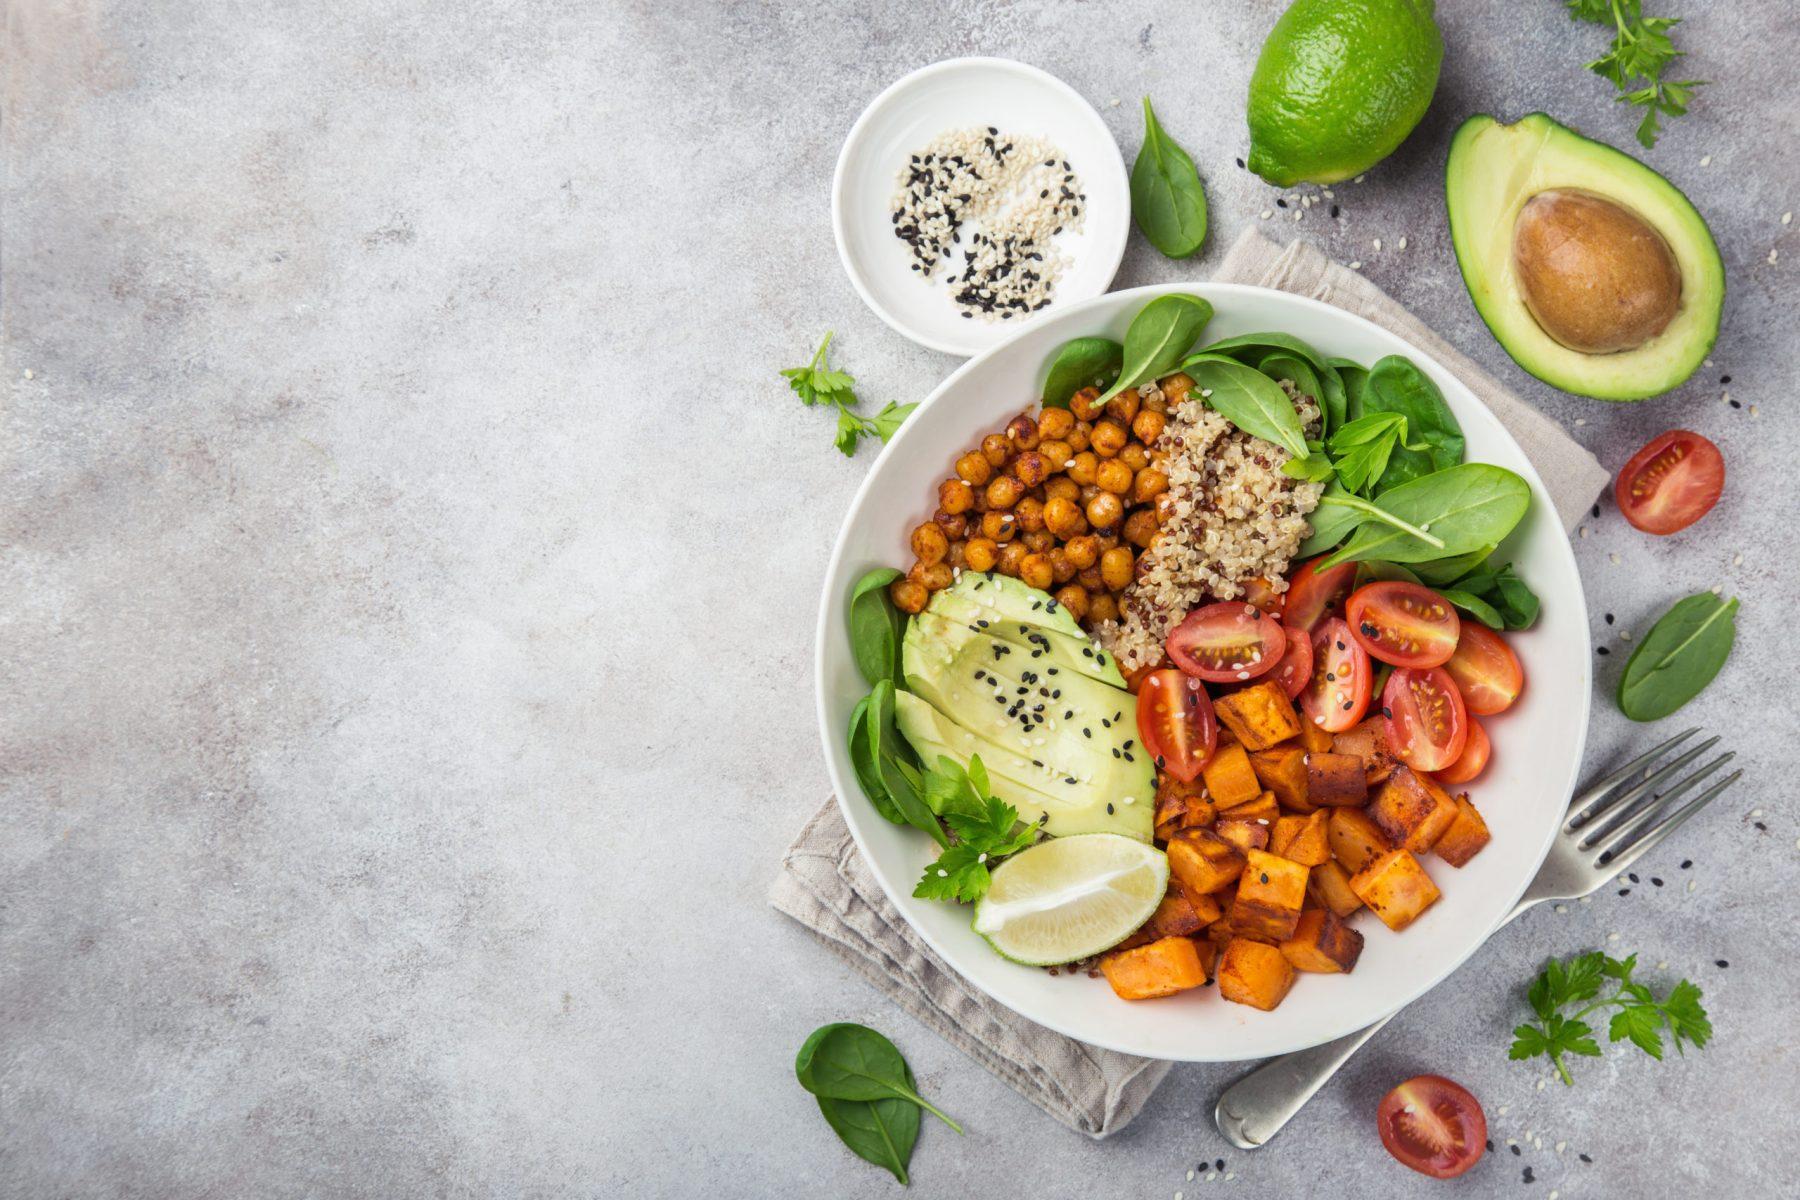 Vegan Διατροφή: Μπορεί να συνδέεται με υψηλότερο κίνδυνο καταγμάτων